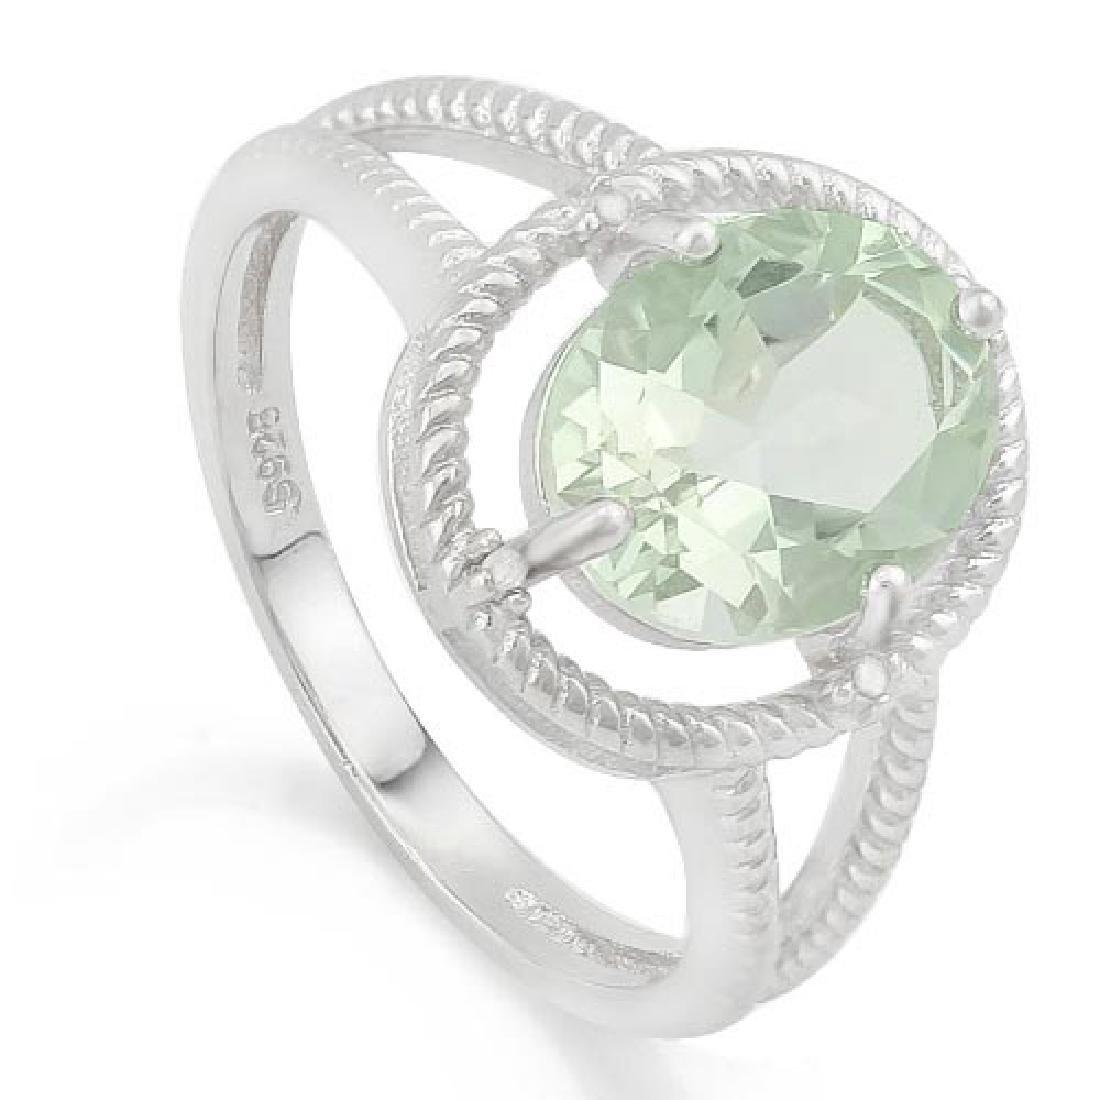 2 2/5 CARAT GREEN AMETHYST & GENUINE DIAMONDS 925 STERL